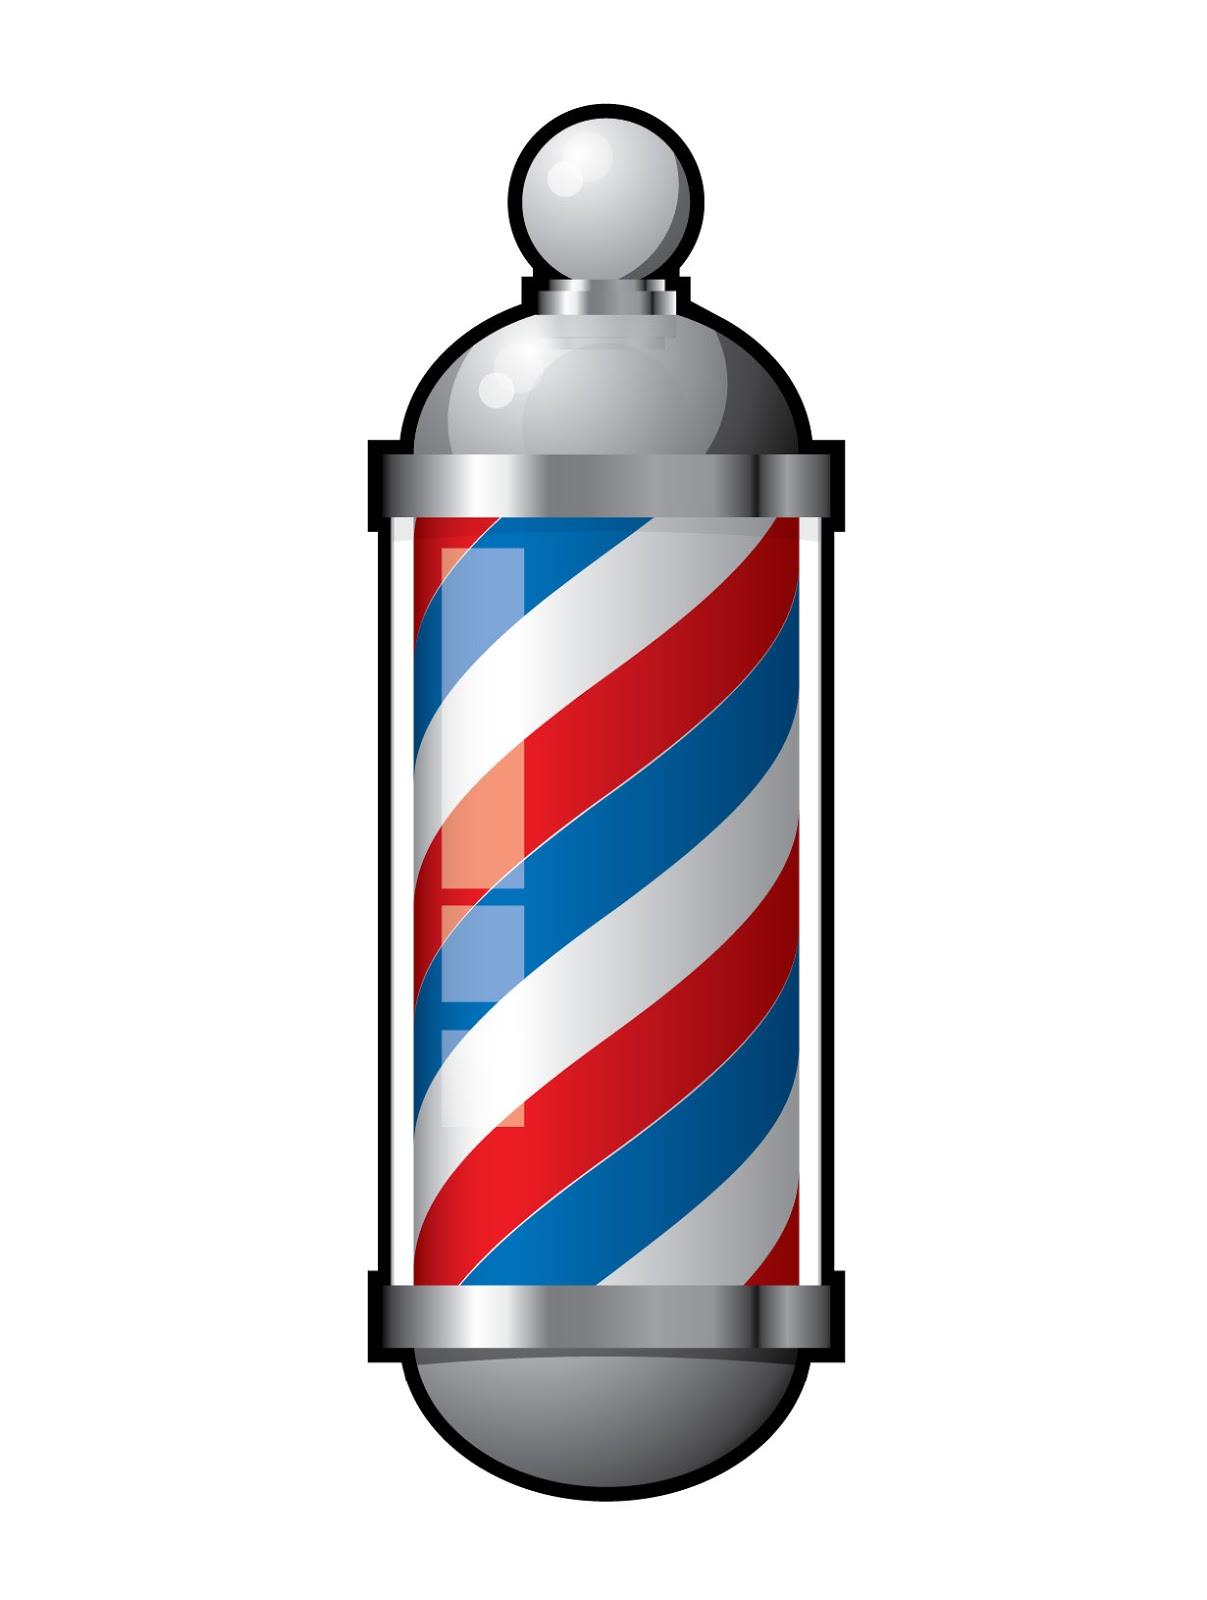 Barber Apparel : Barber Shop Logos